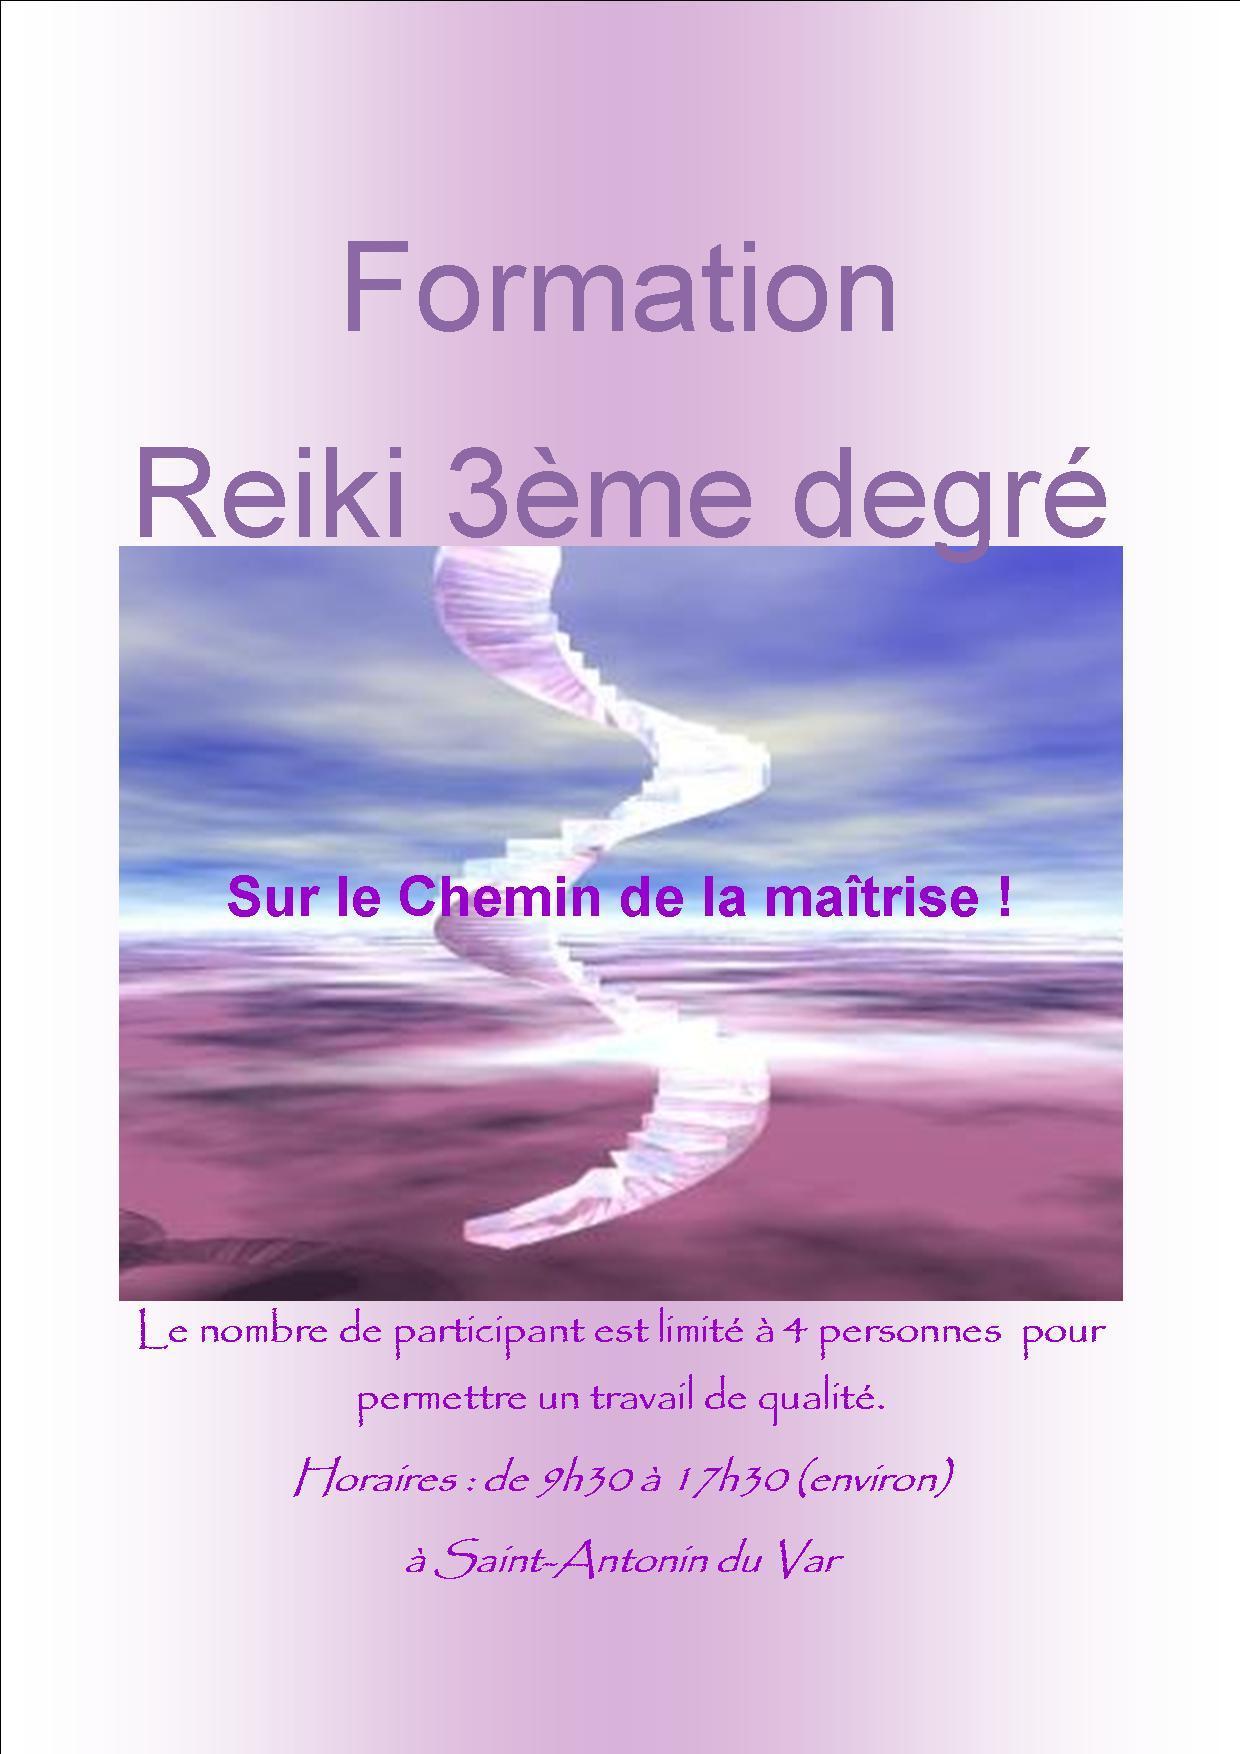 Formation 3eme degre 1